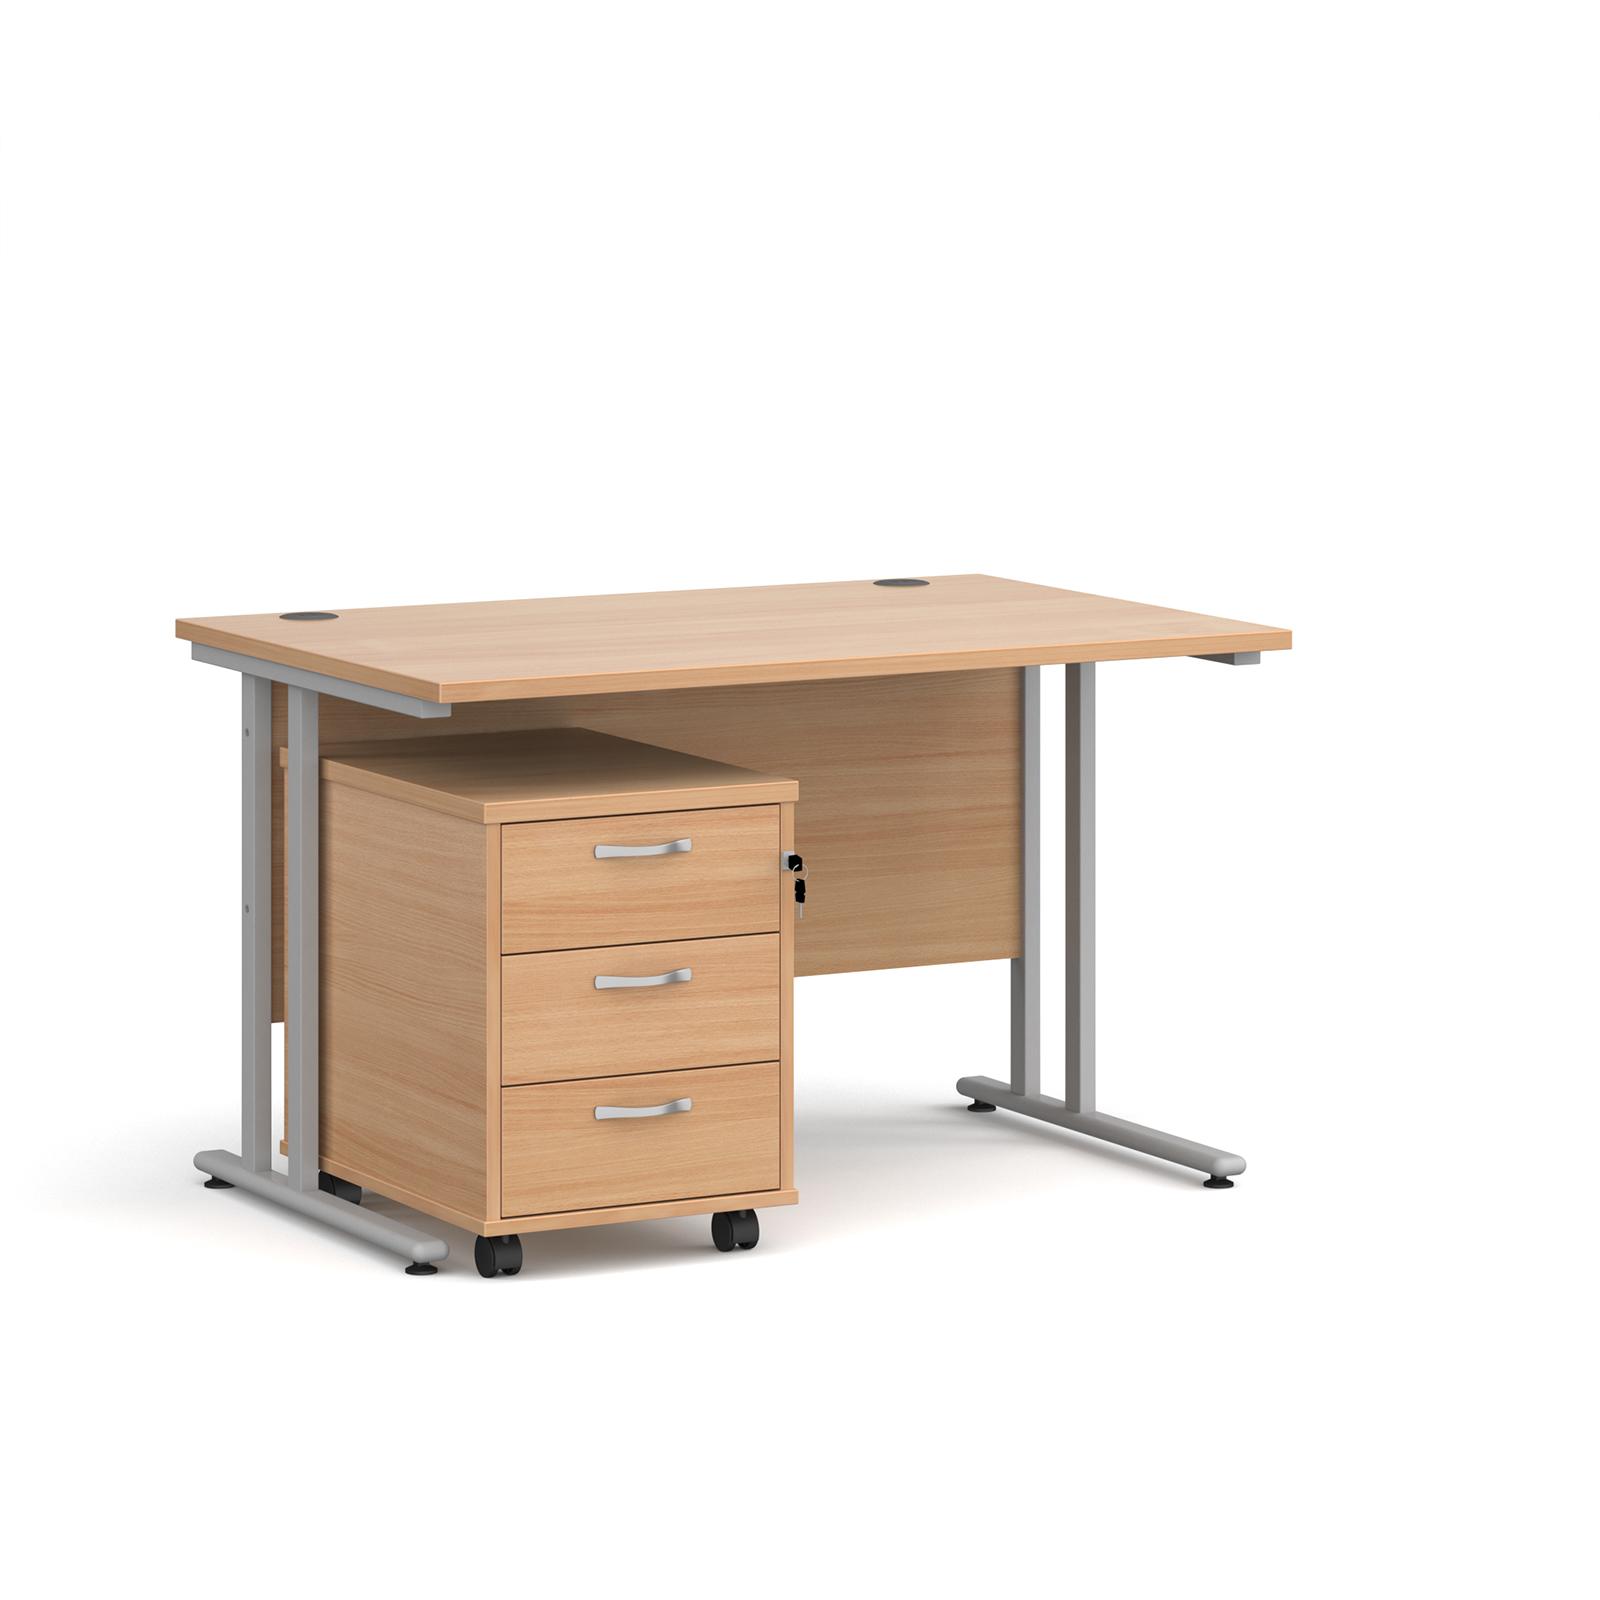 Desks Maestro 25 desk 800mm with 3 drawer pedestal